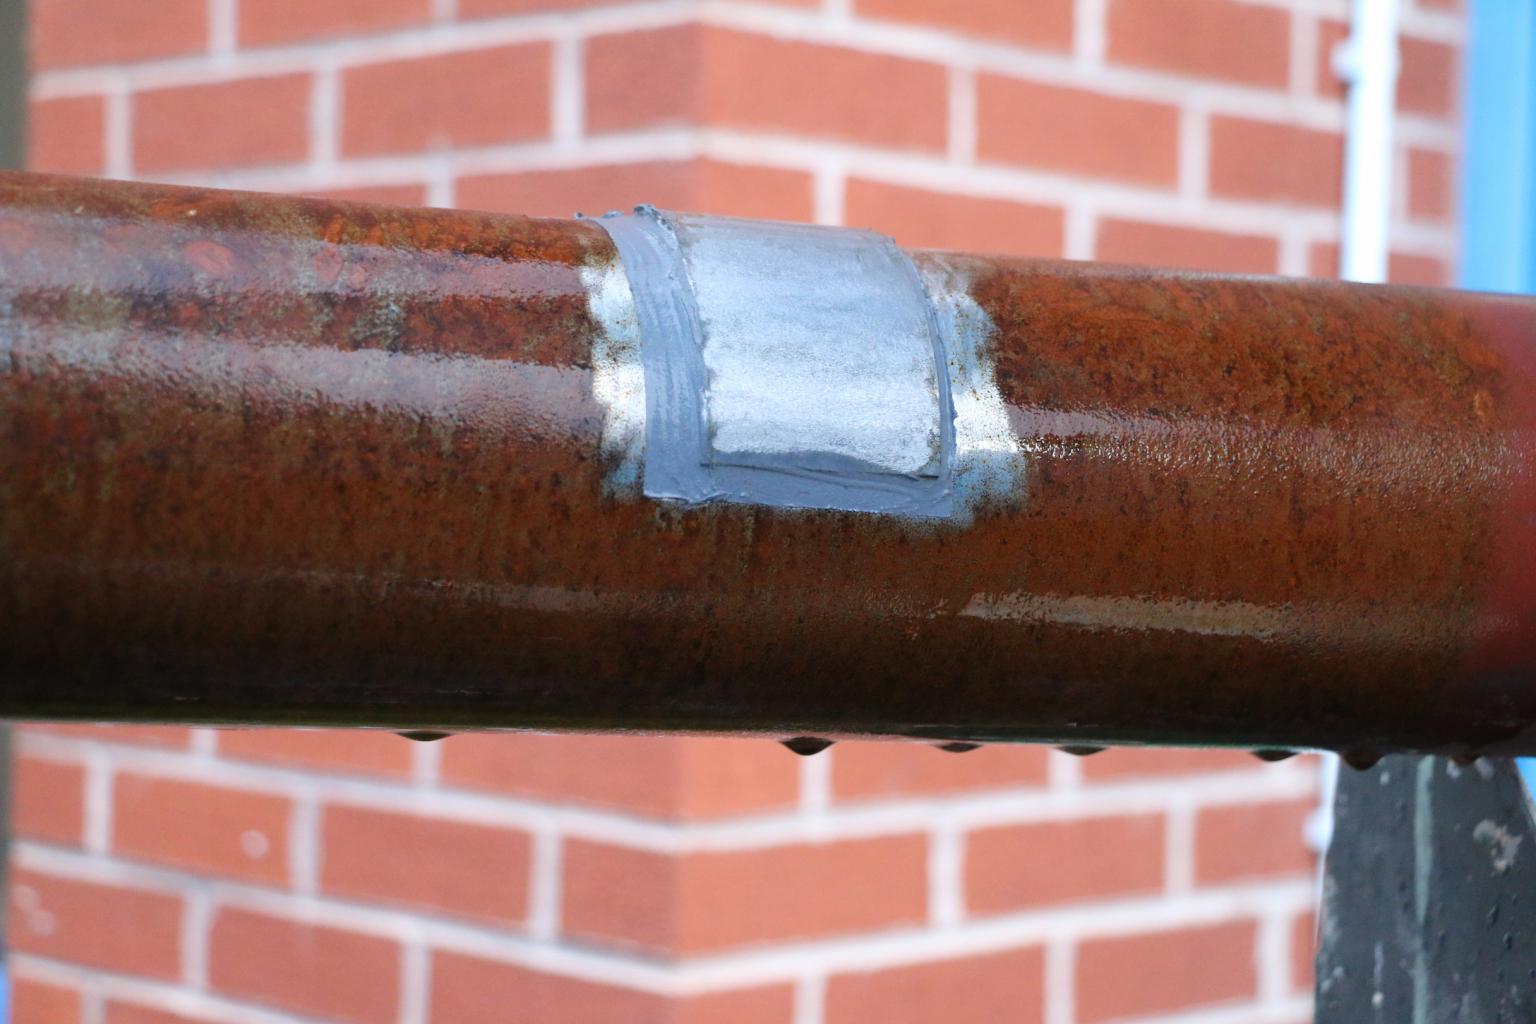 Belzona 1212 applied to seal a pipe leak